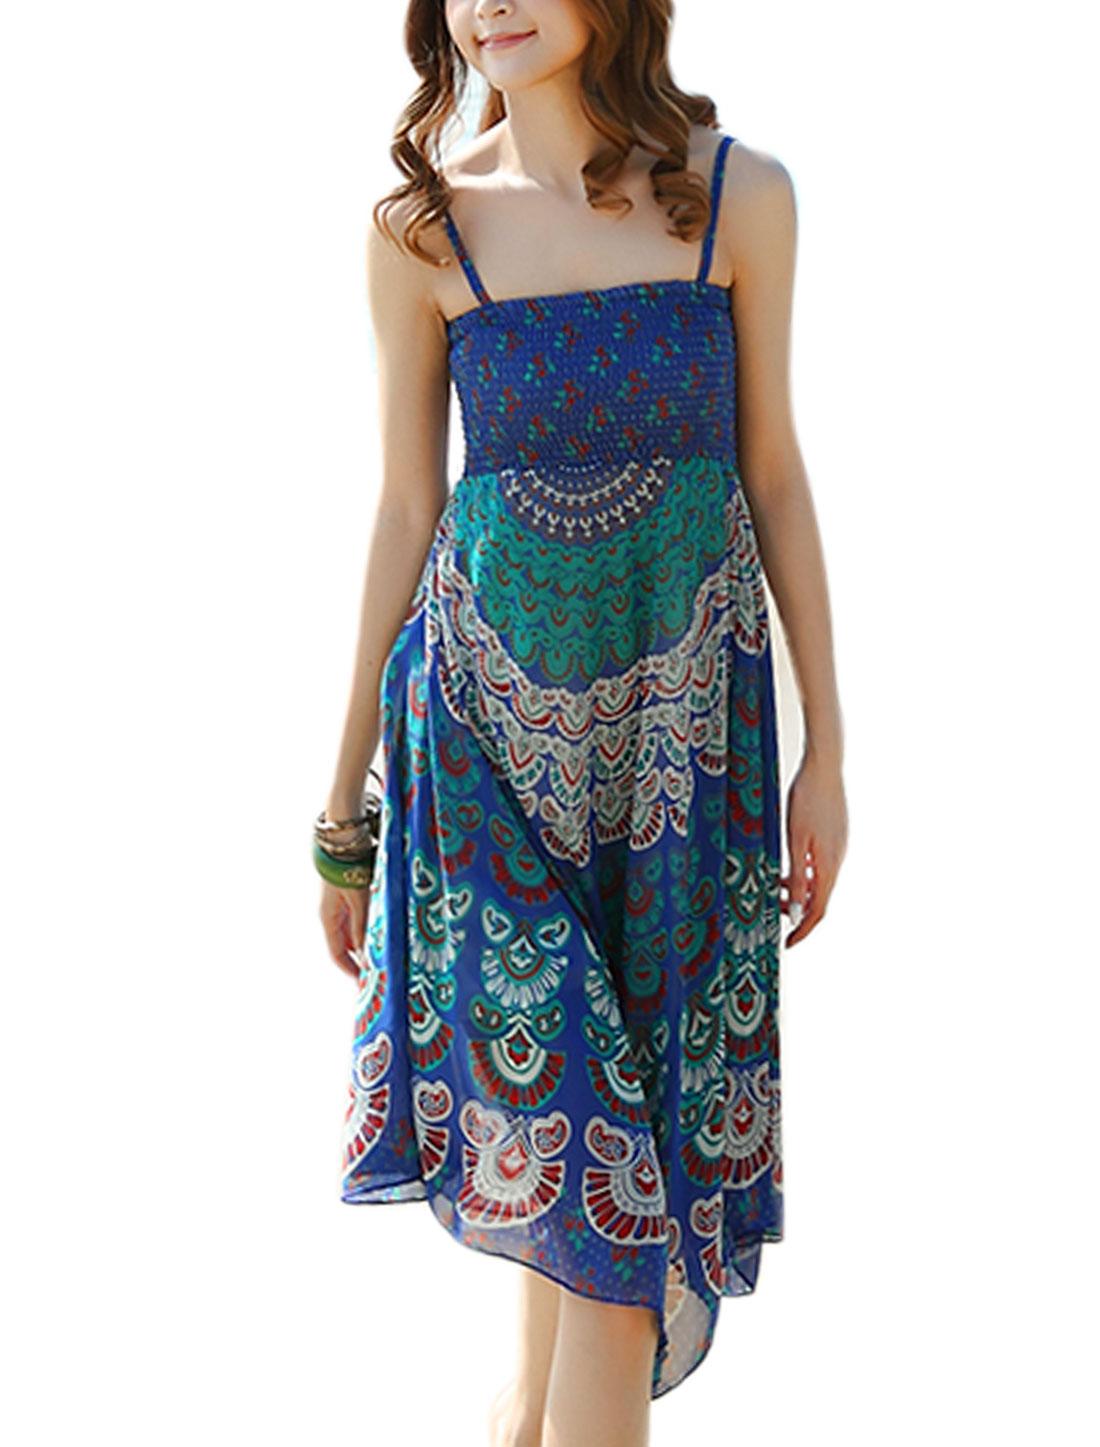 Women Stretchy Detail Peacock Feathers Pattern Chiffon Asymmetrical Hem Dress Blue XS